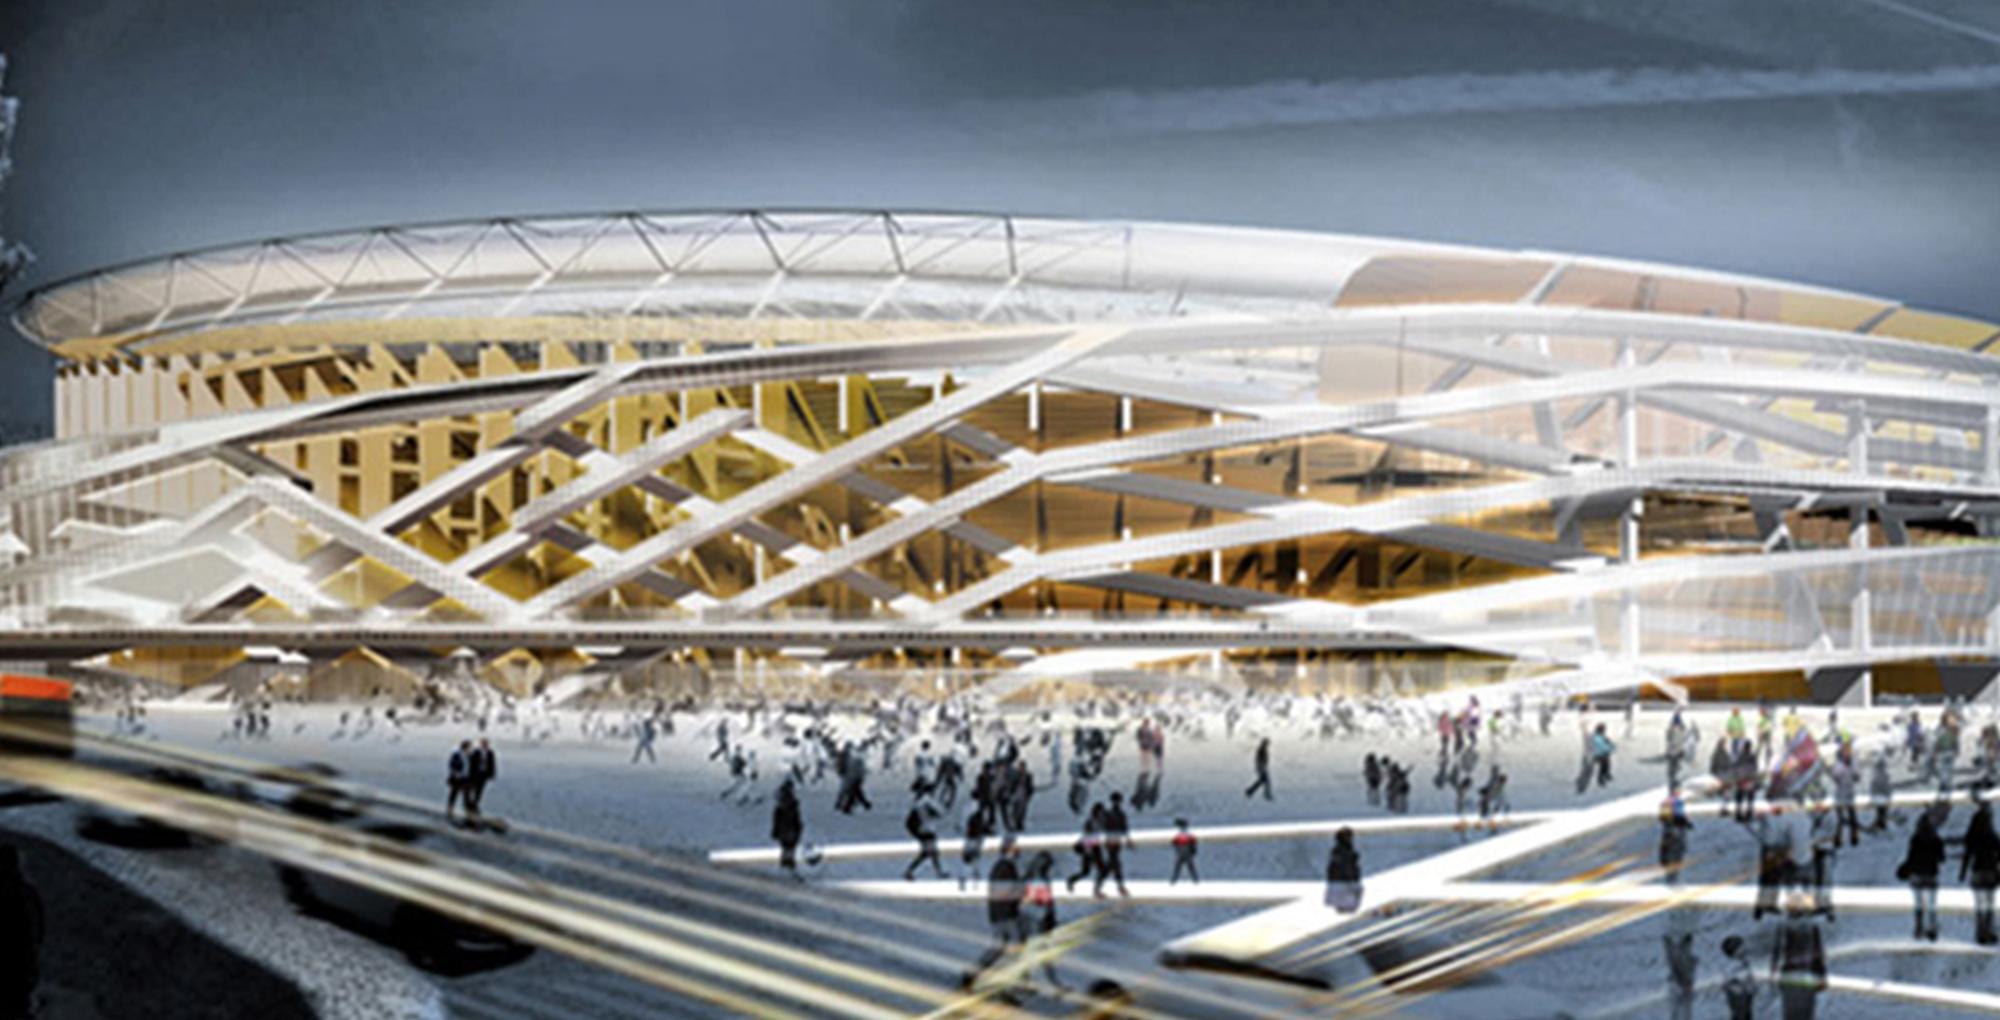 New Camp Nou stadium in Barcelona